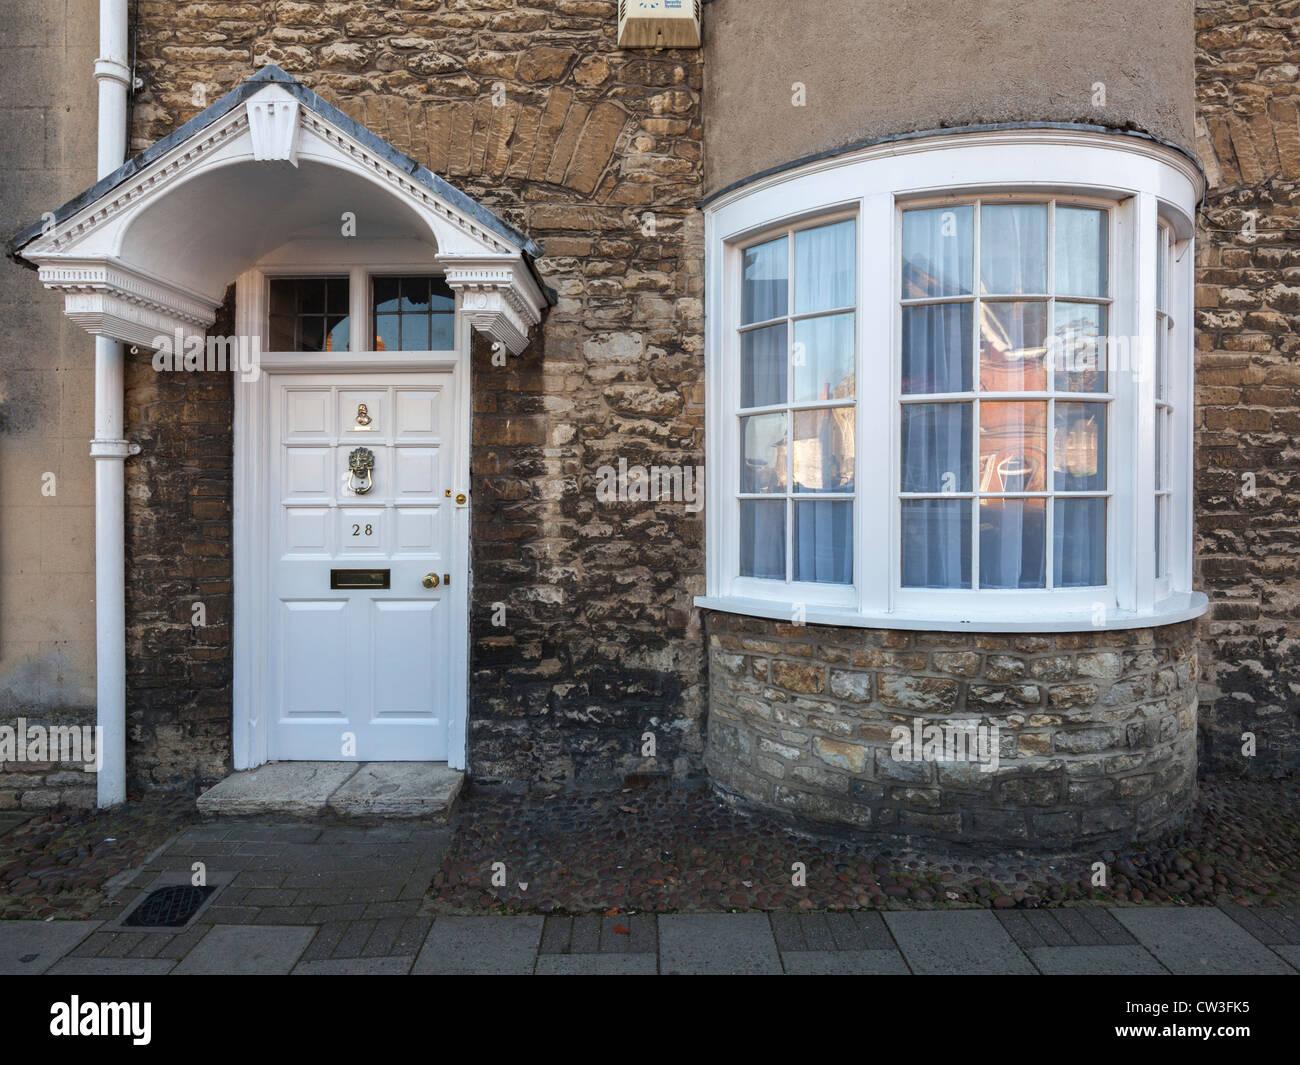 Cromwell's House, Woodstock - Stock Image